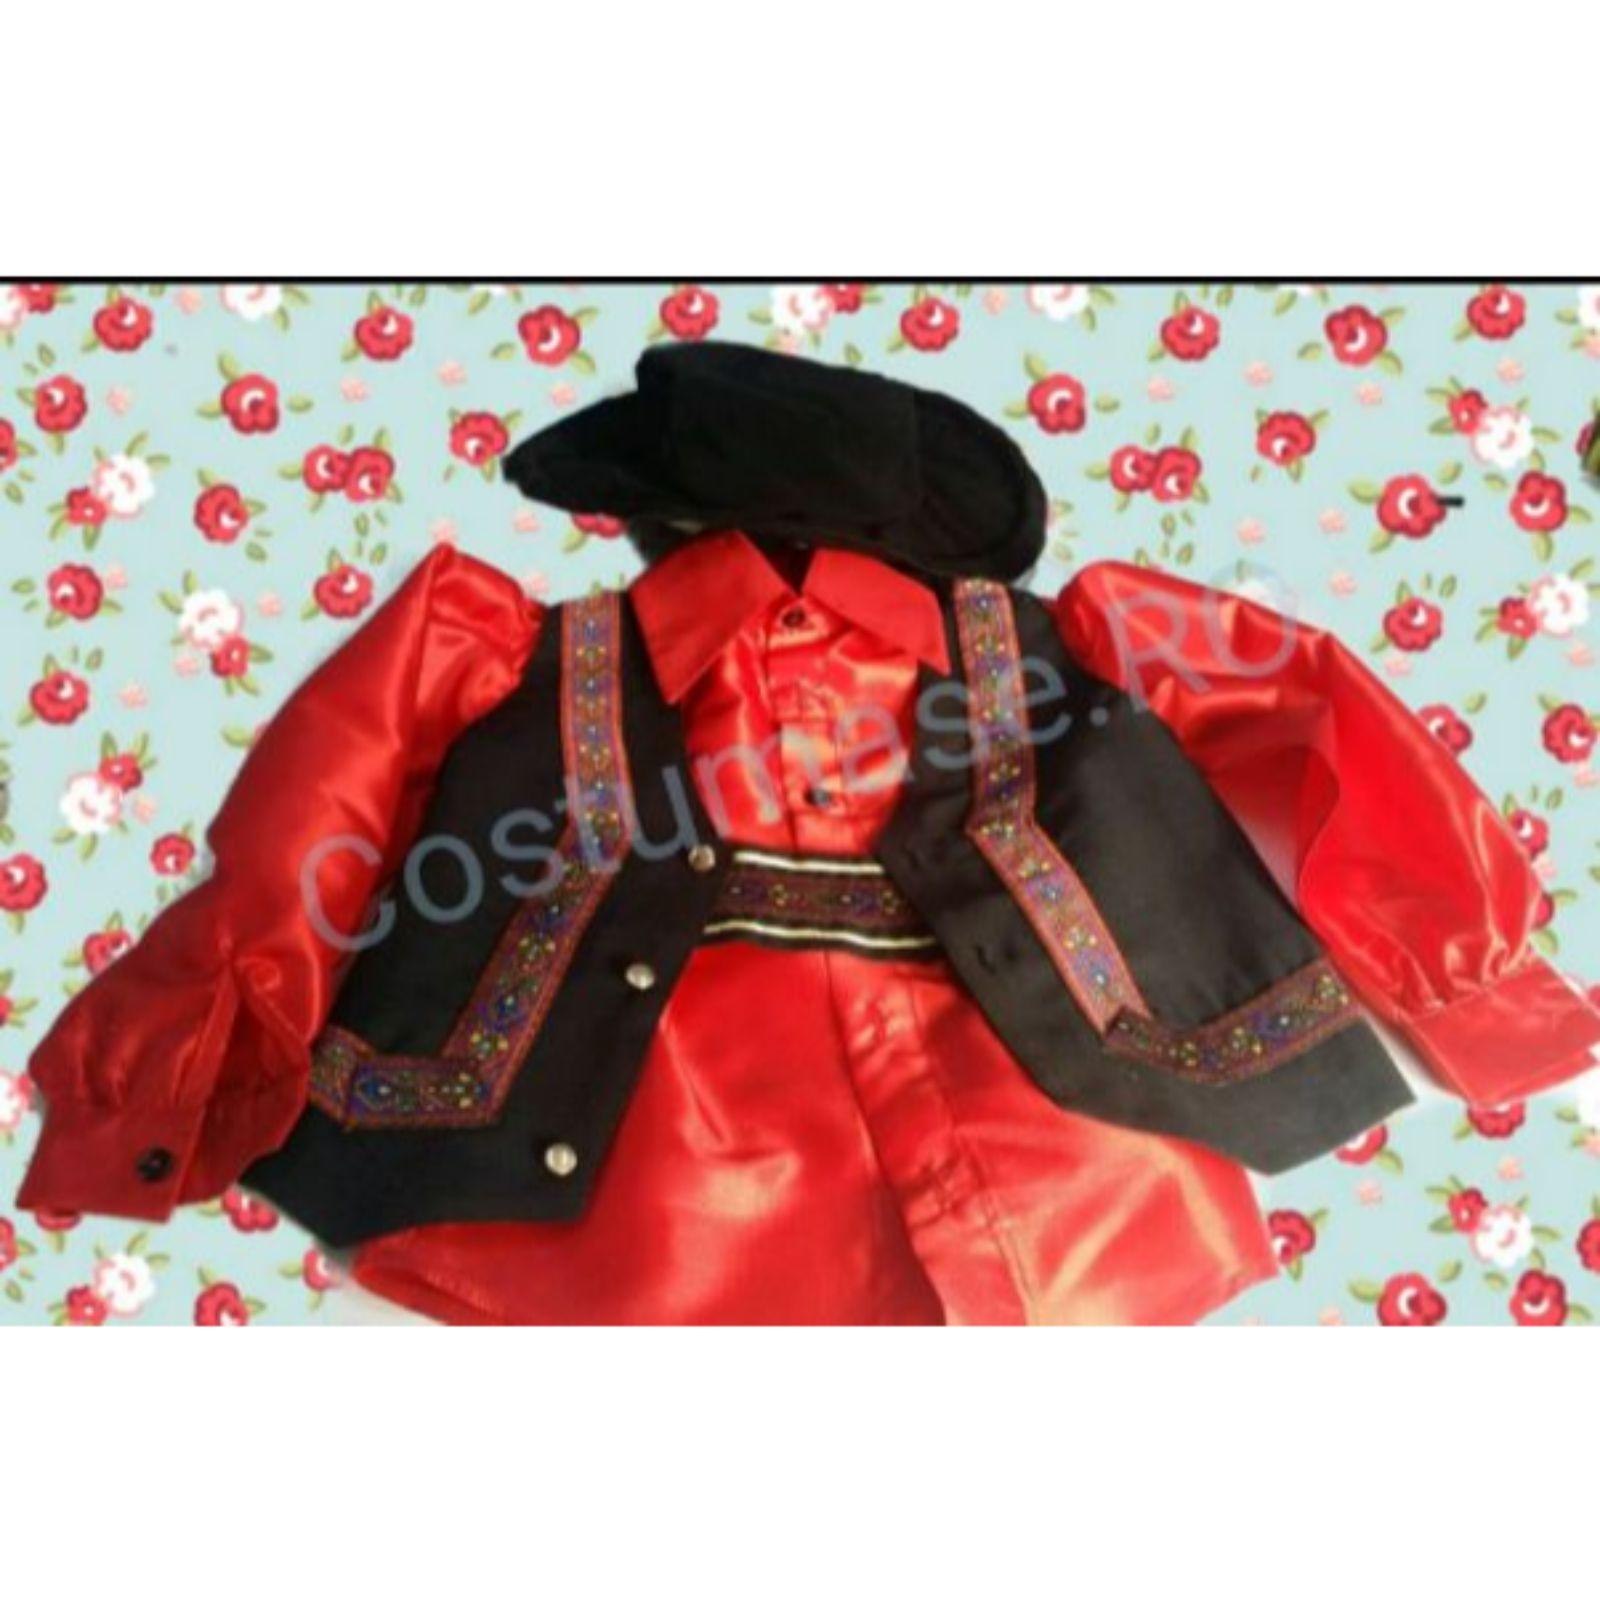 Costum țigan – roșu cu aplicații 1